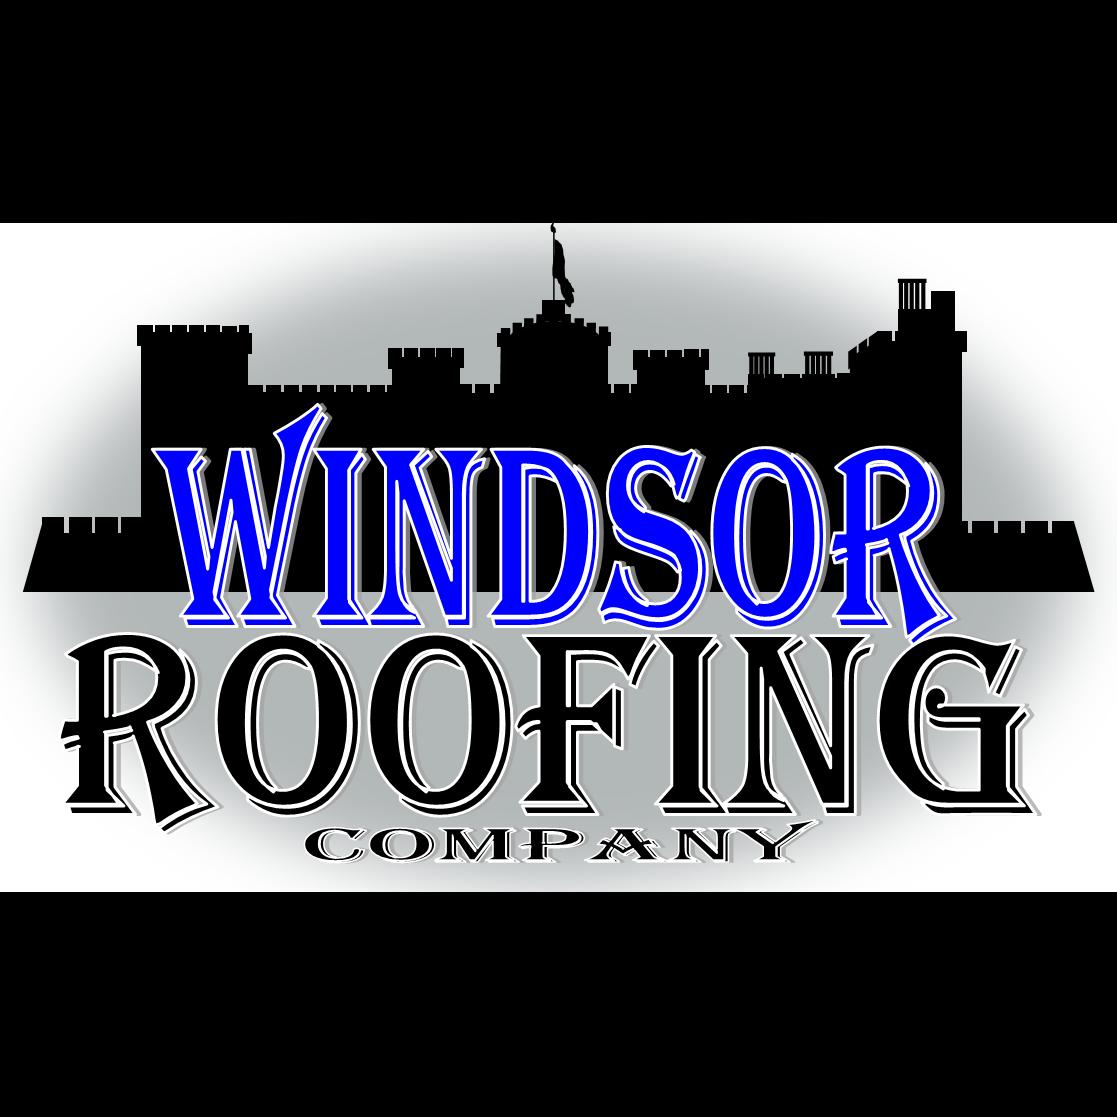 Windsor Roofing Co.